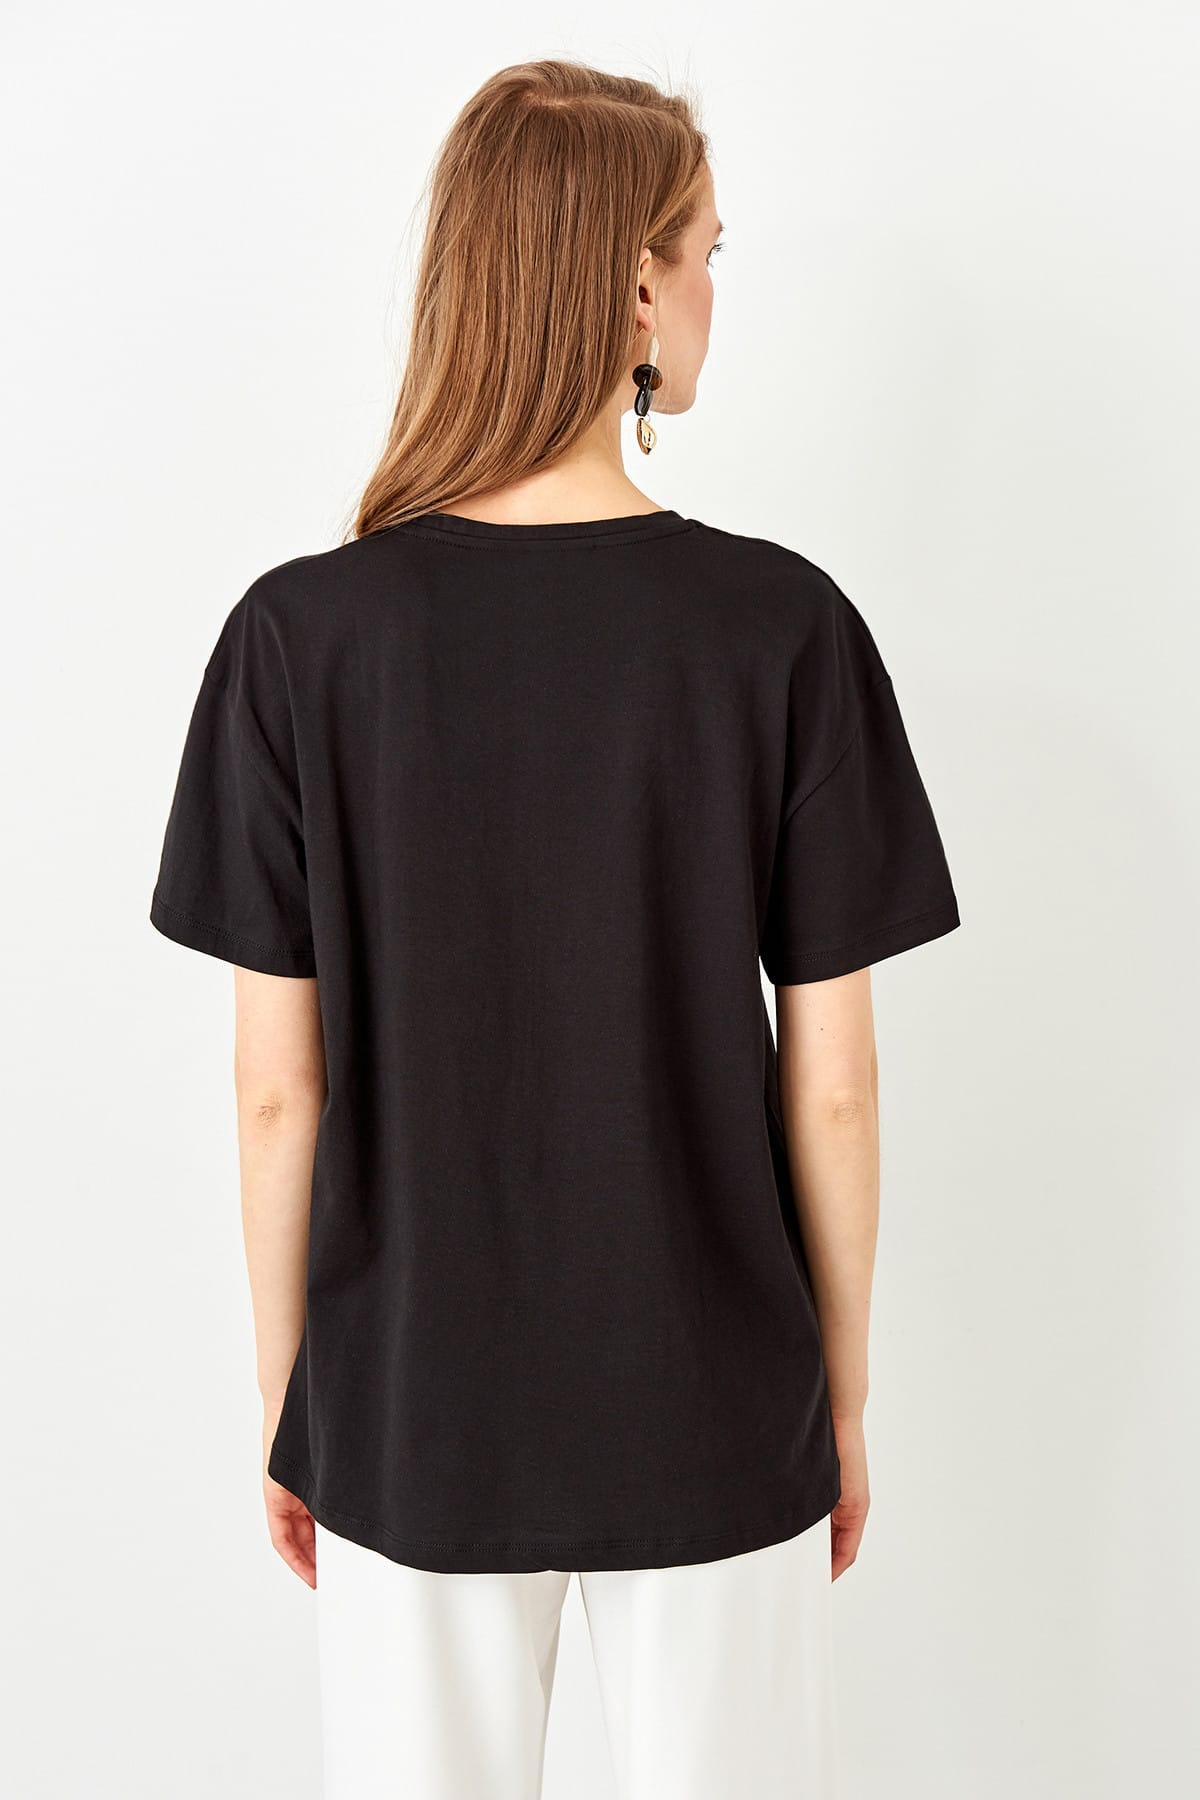 TRENDYOLMİLLA Siyah Nakışlı Boyfriend Örme T-shirt TWOSS19IS0051